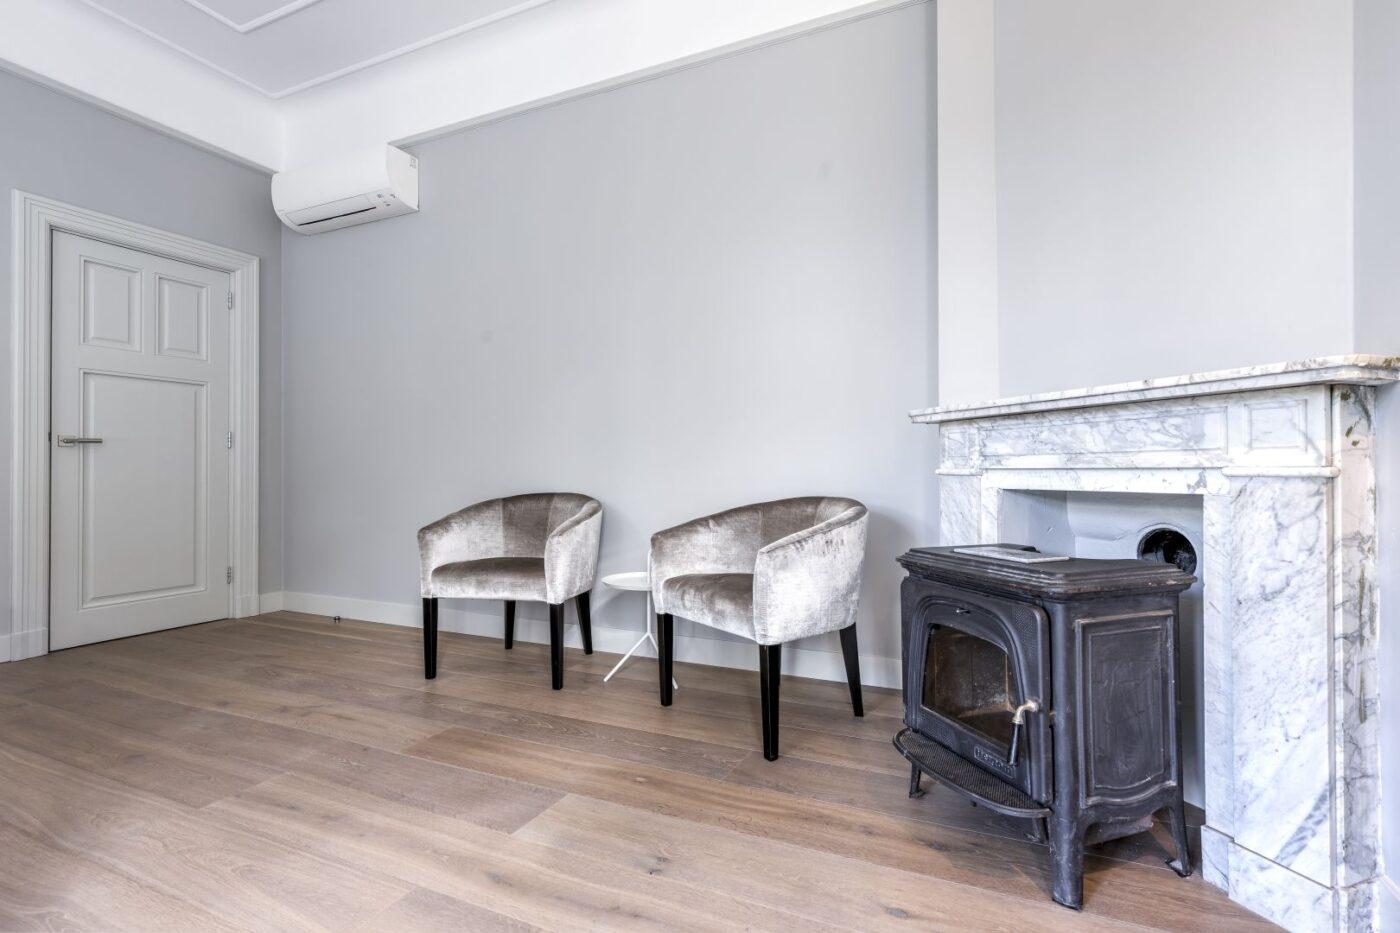 Donkere houten planken vloer in de woonkamer in Bussum